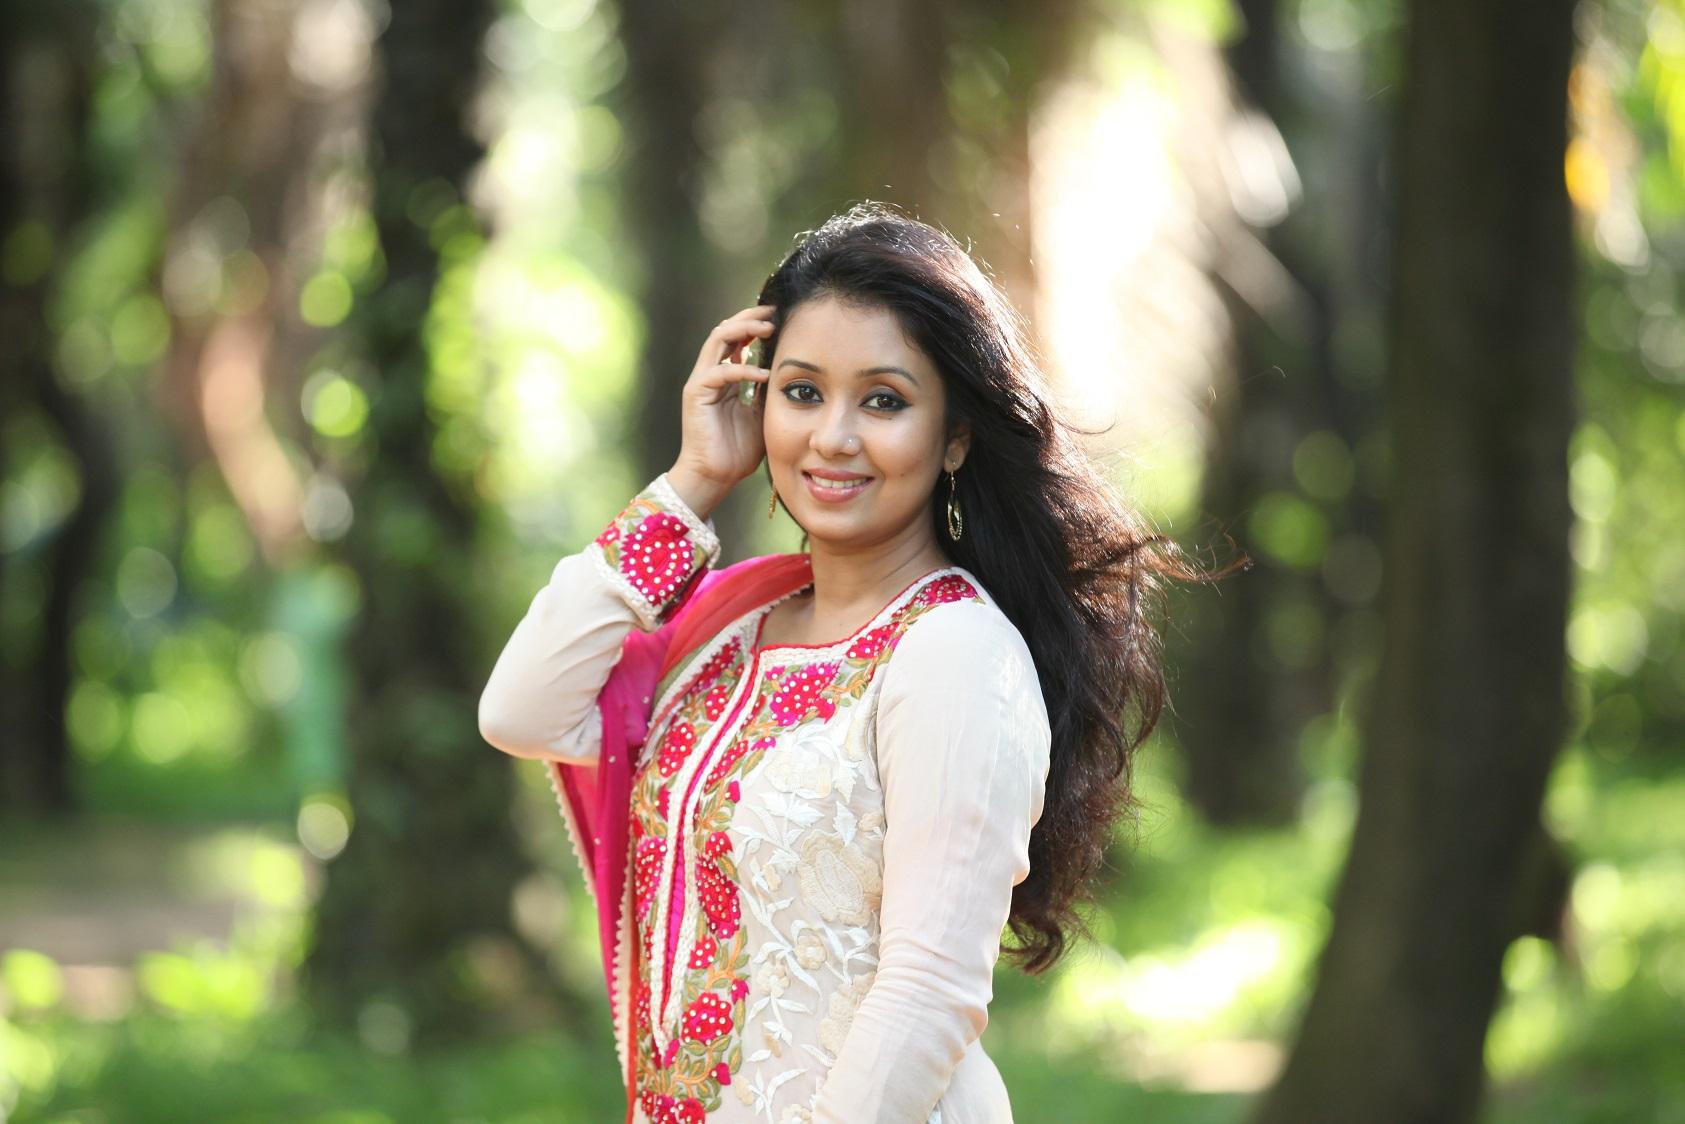 Bangladeshi-model-Farhana-Mili